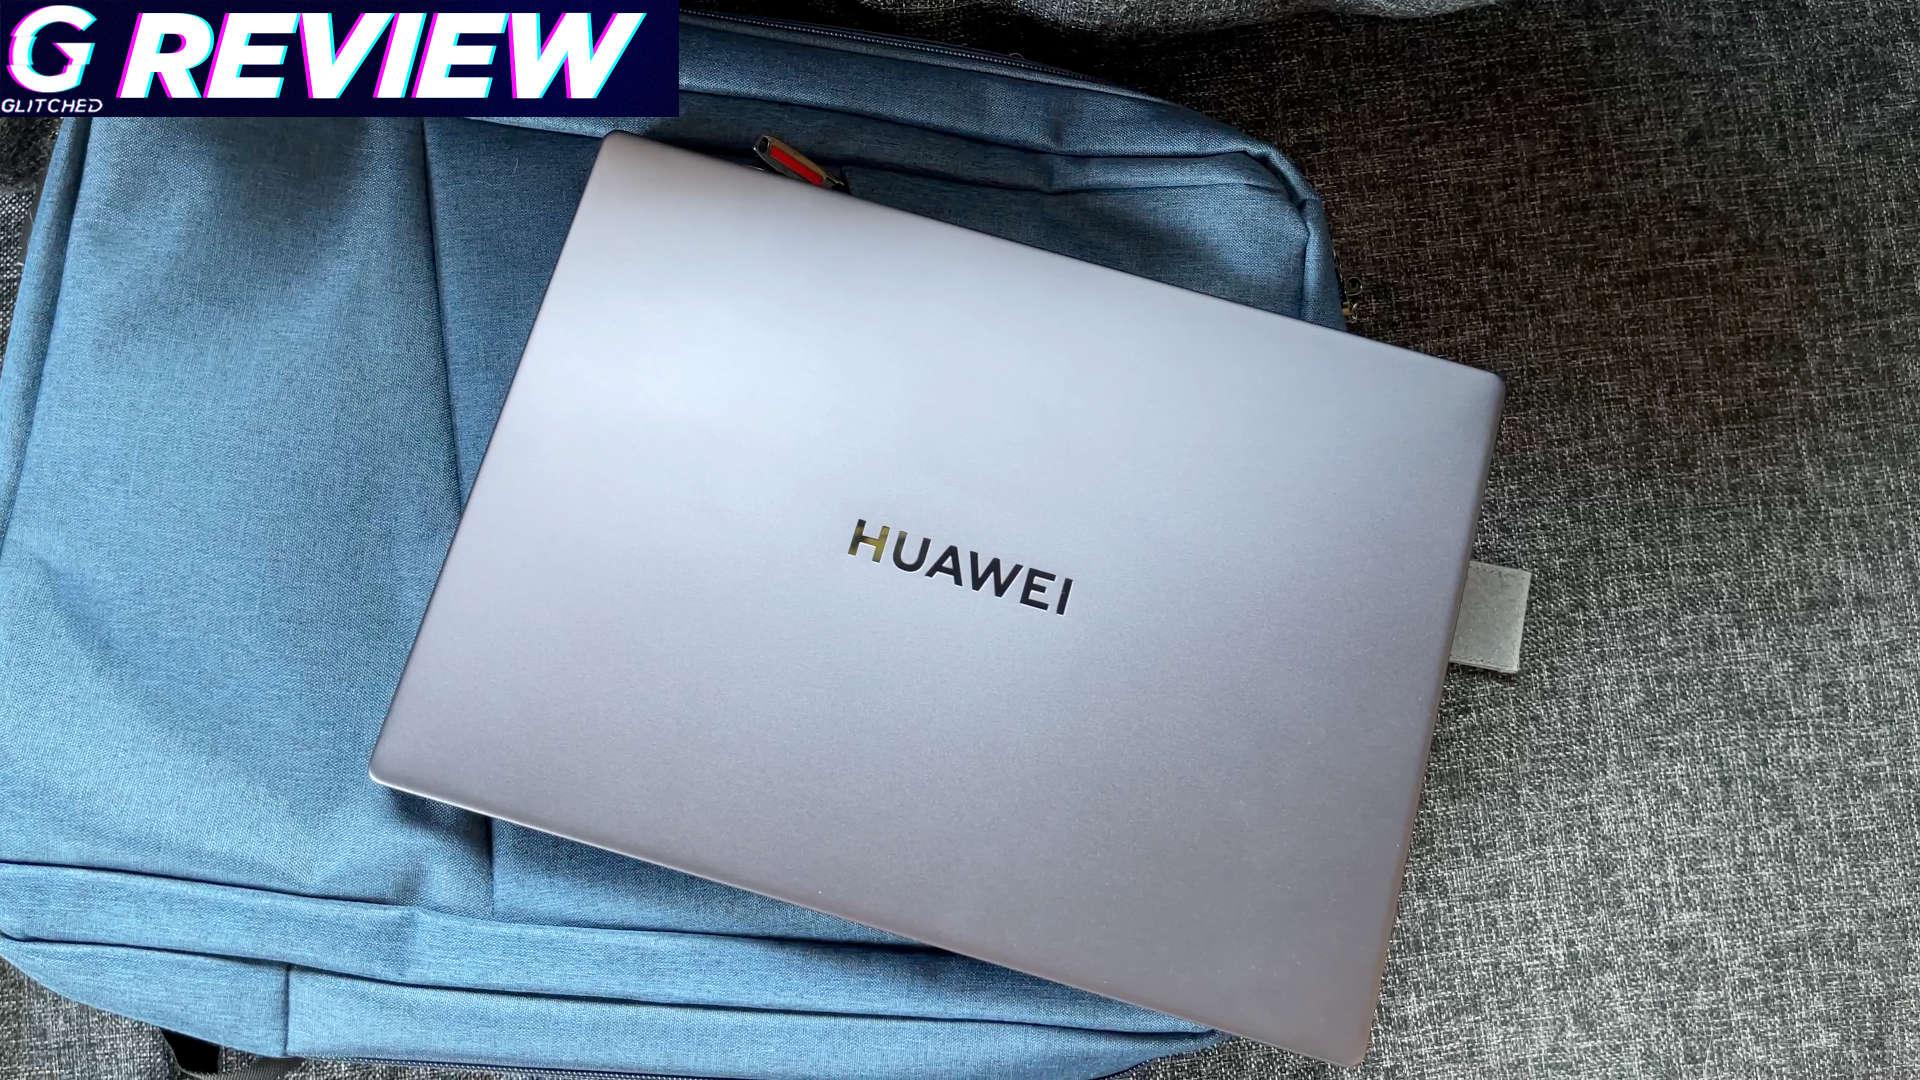 Huawei MateBook 14 Review – The Windows 10 MacBook?